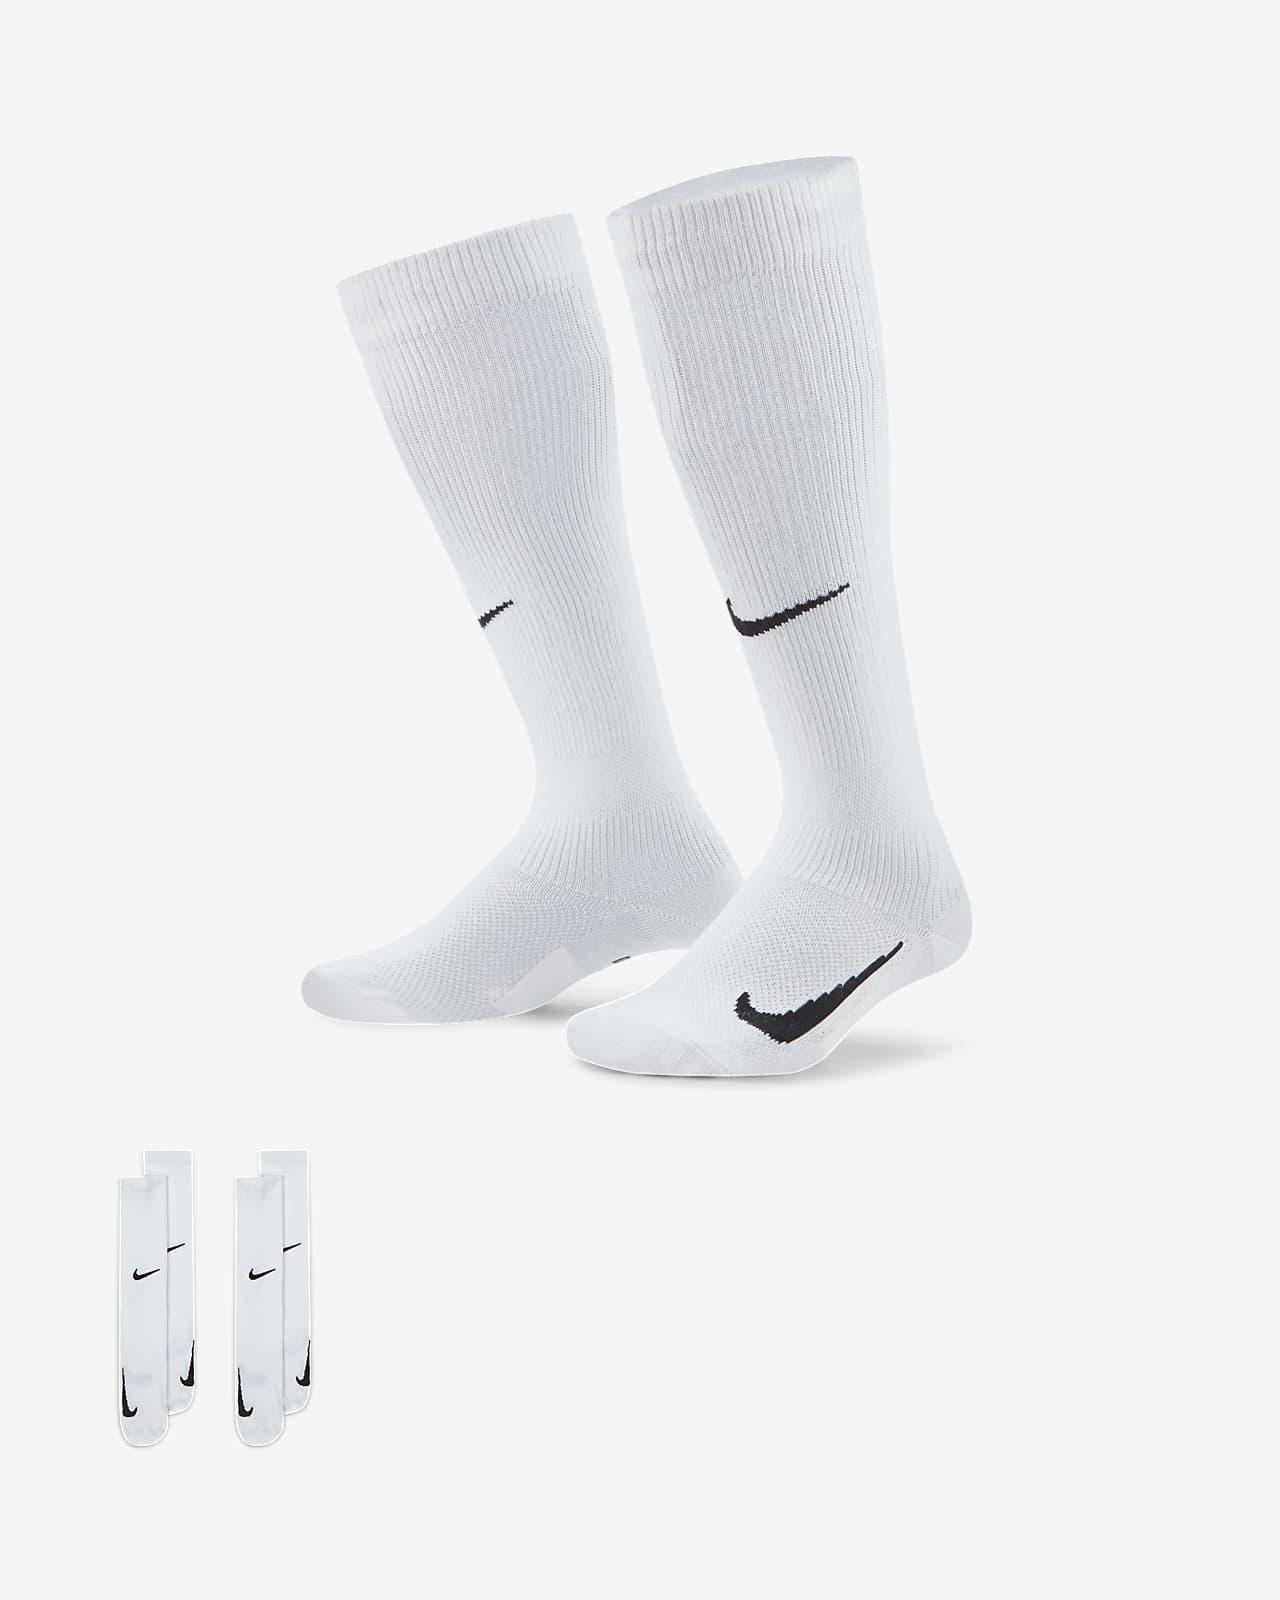 Nike Swoosh Over-the-Calf 儿童足球童袜(2 双)